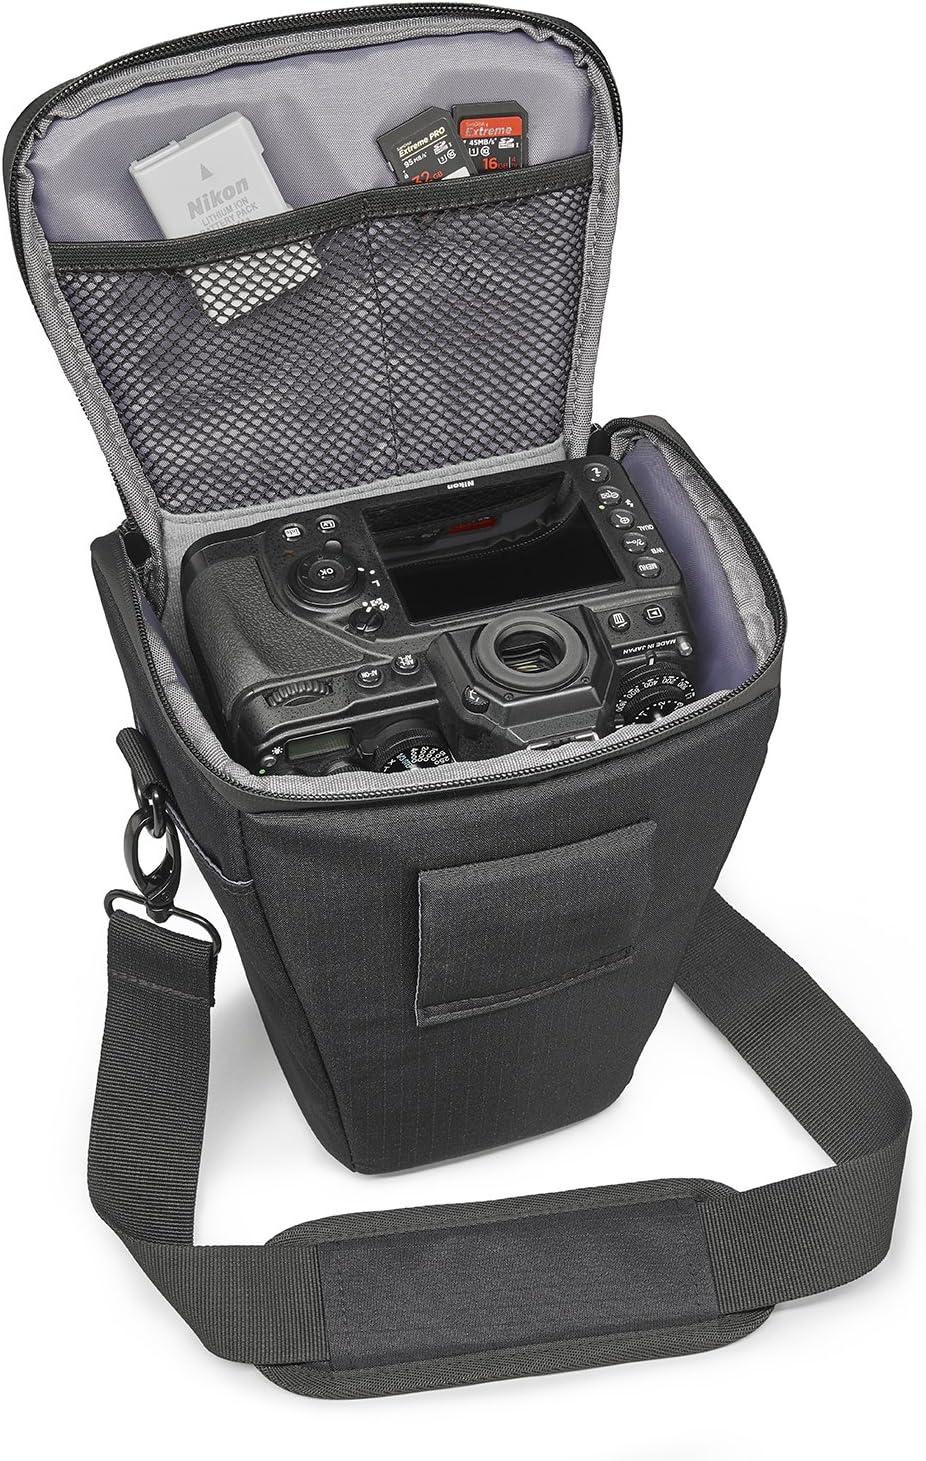 Cullmann Malaga Maxima 200 Kameratasche Für Kamera